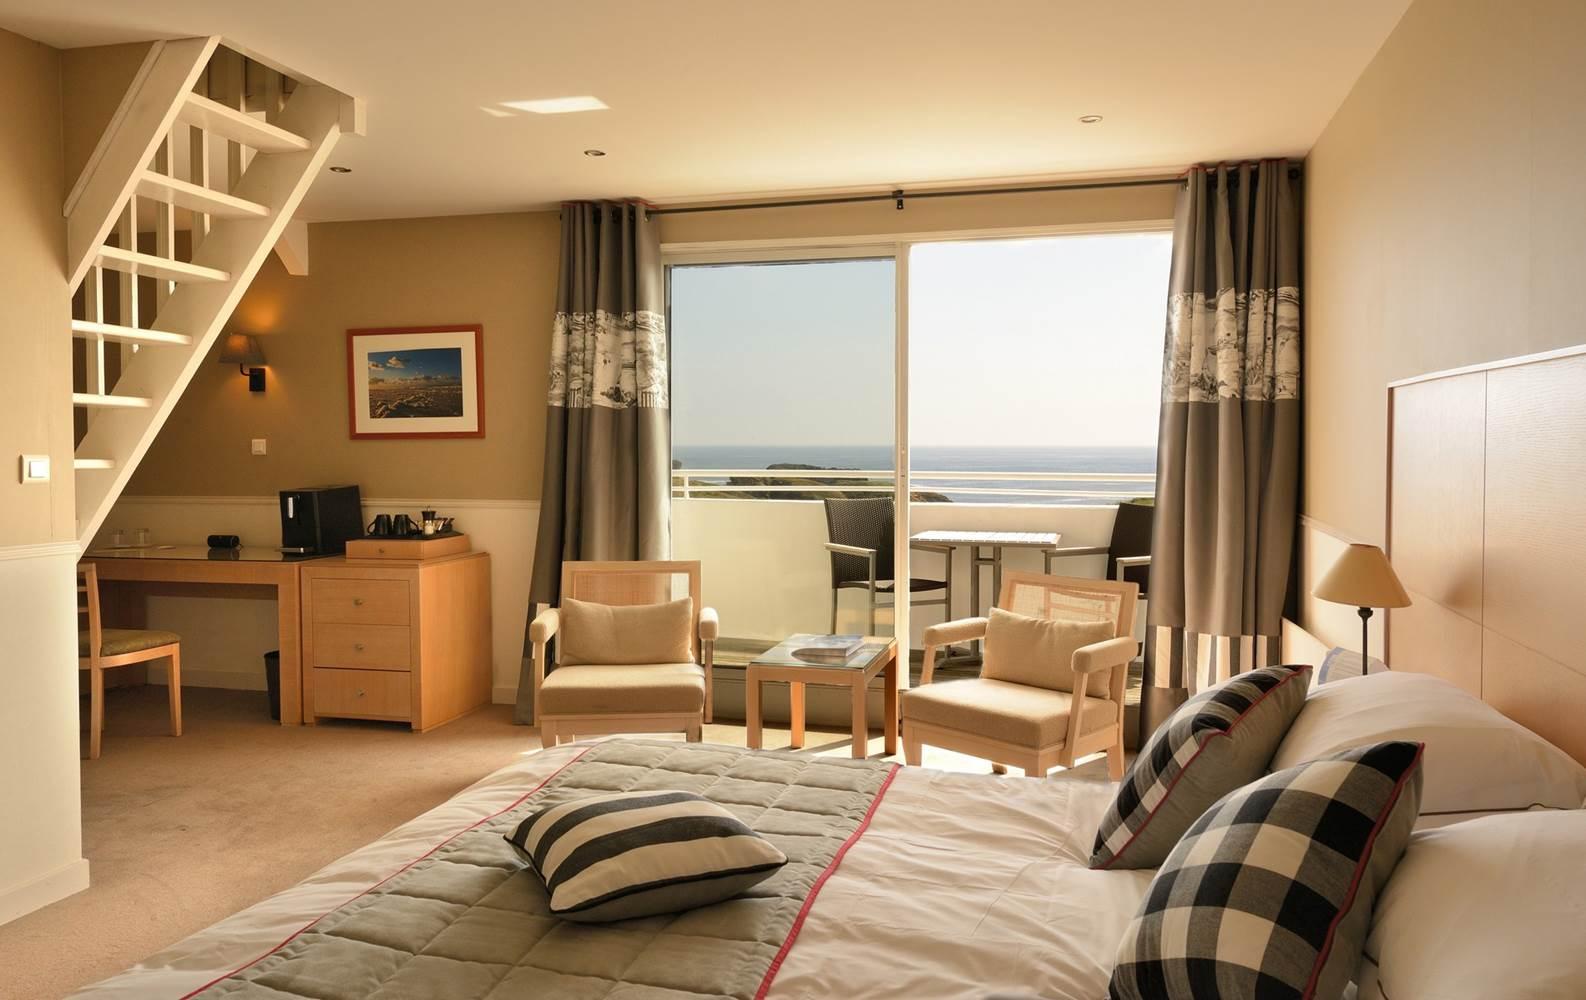 Hotel castel clara - suite - Belle ile en mer Morbihan bretagne sud ©